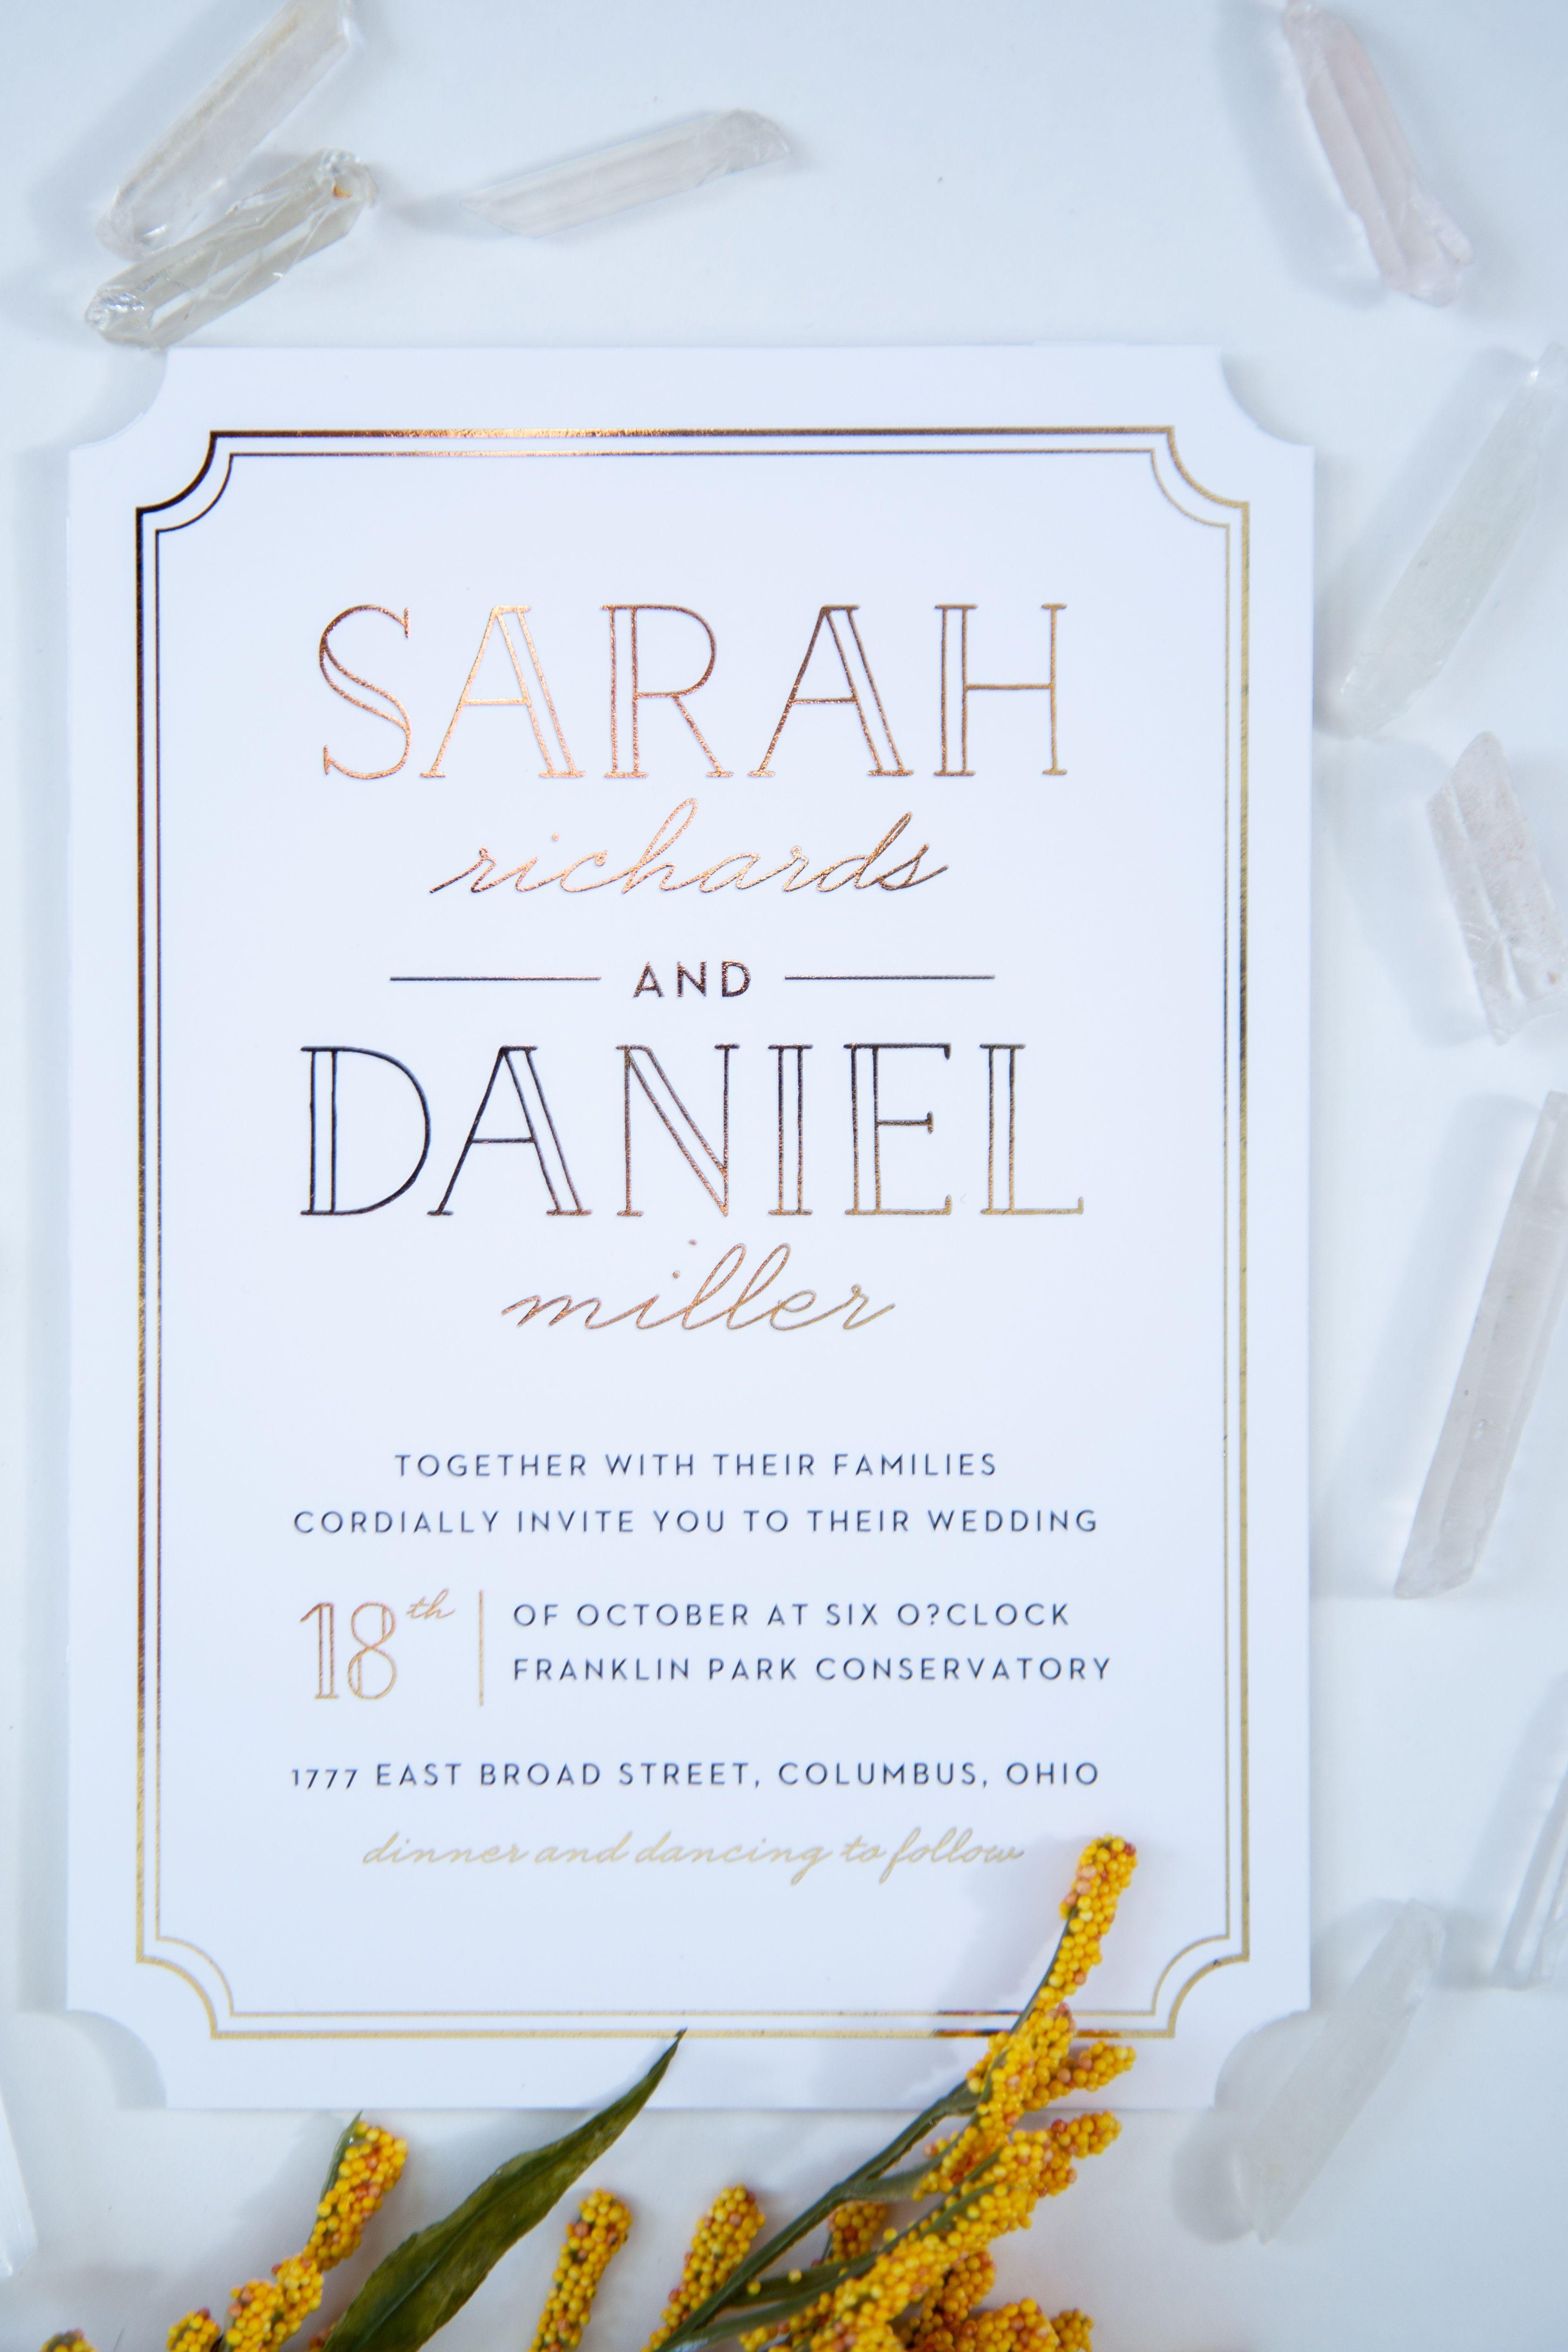 Type Frame Wedding Invitations Discount Wedding Invitations Affordable Wedding Invitations Inexpensive Wedding Invitations